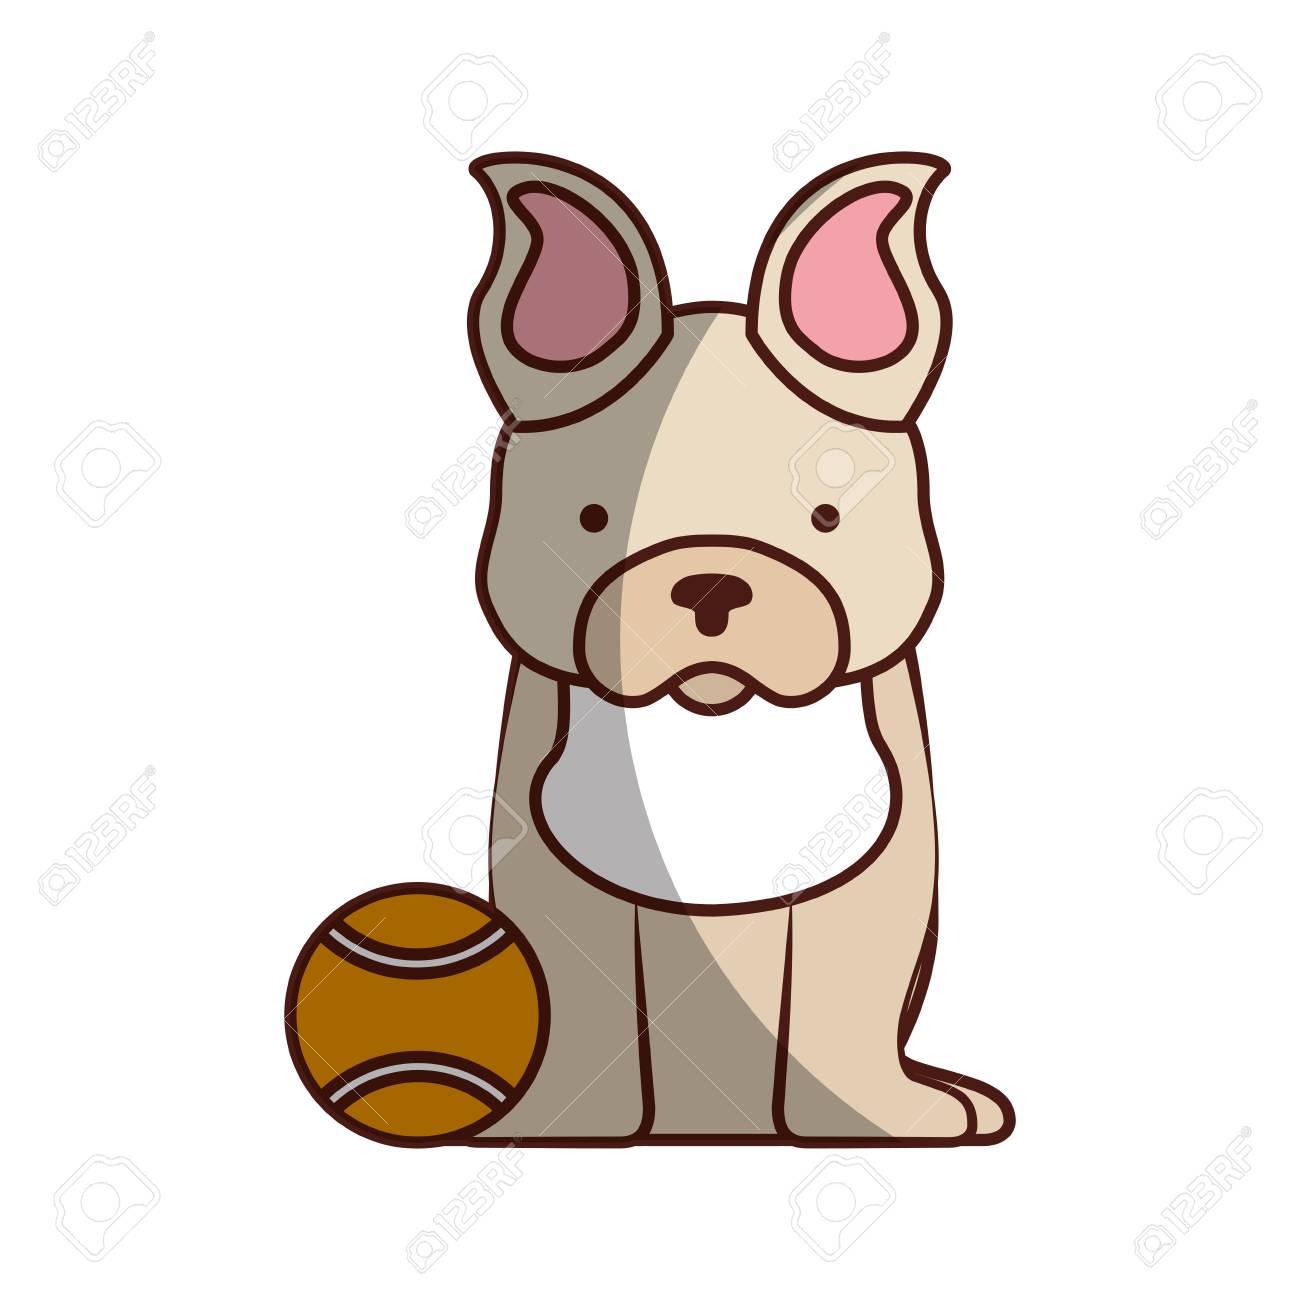 Best Bulldog Ball Adorable Dog - 81845204-cute-dog-mascot-with-tennis-ball-vector-illustration-design  Photograph_32525  .jpg